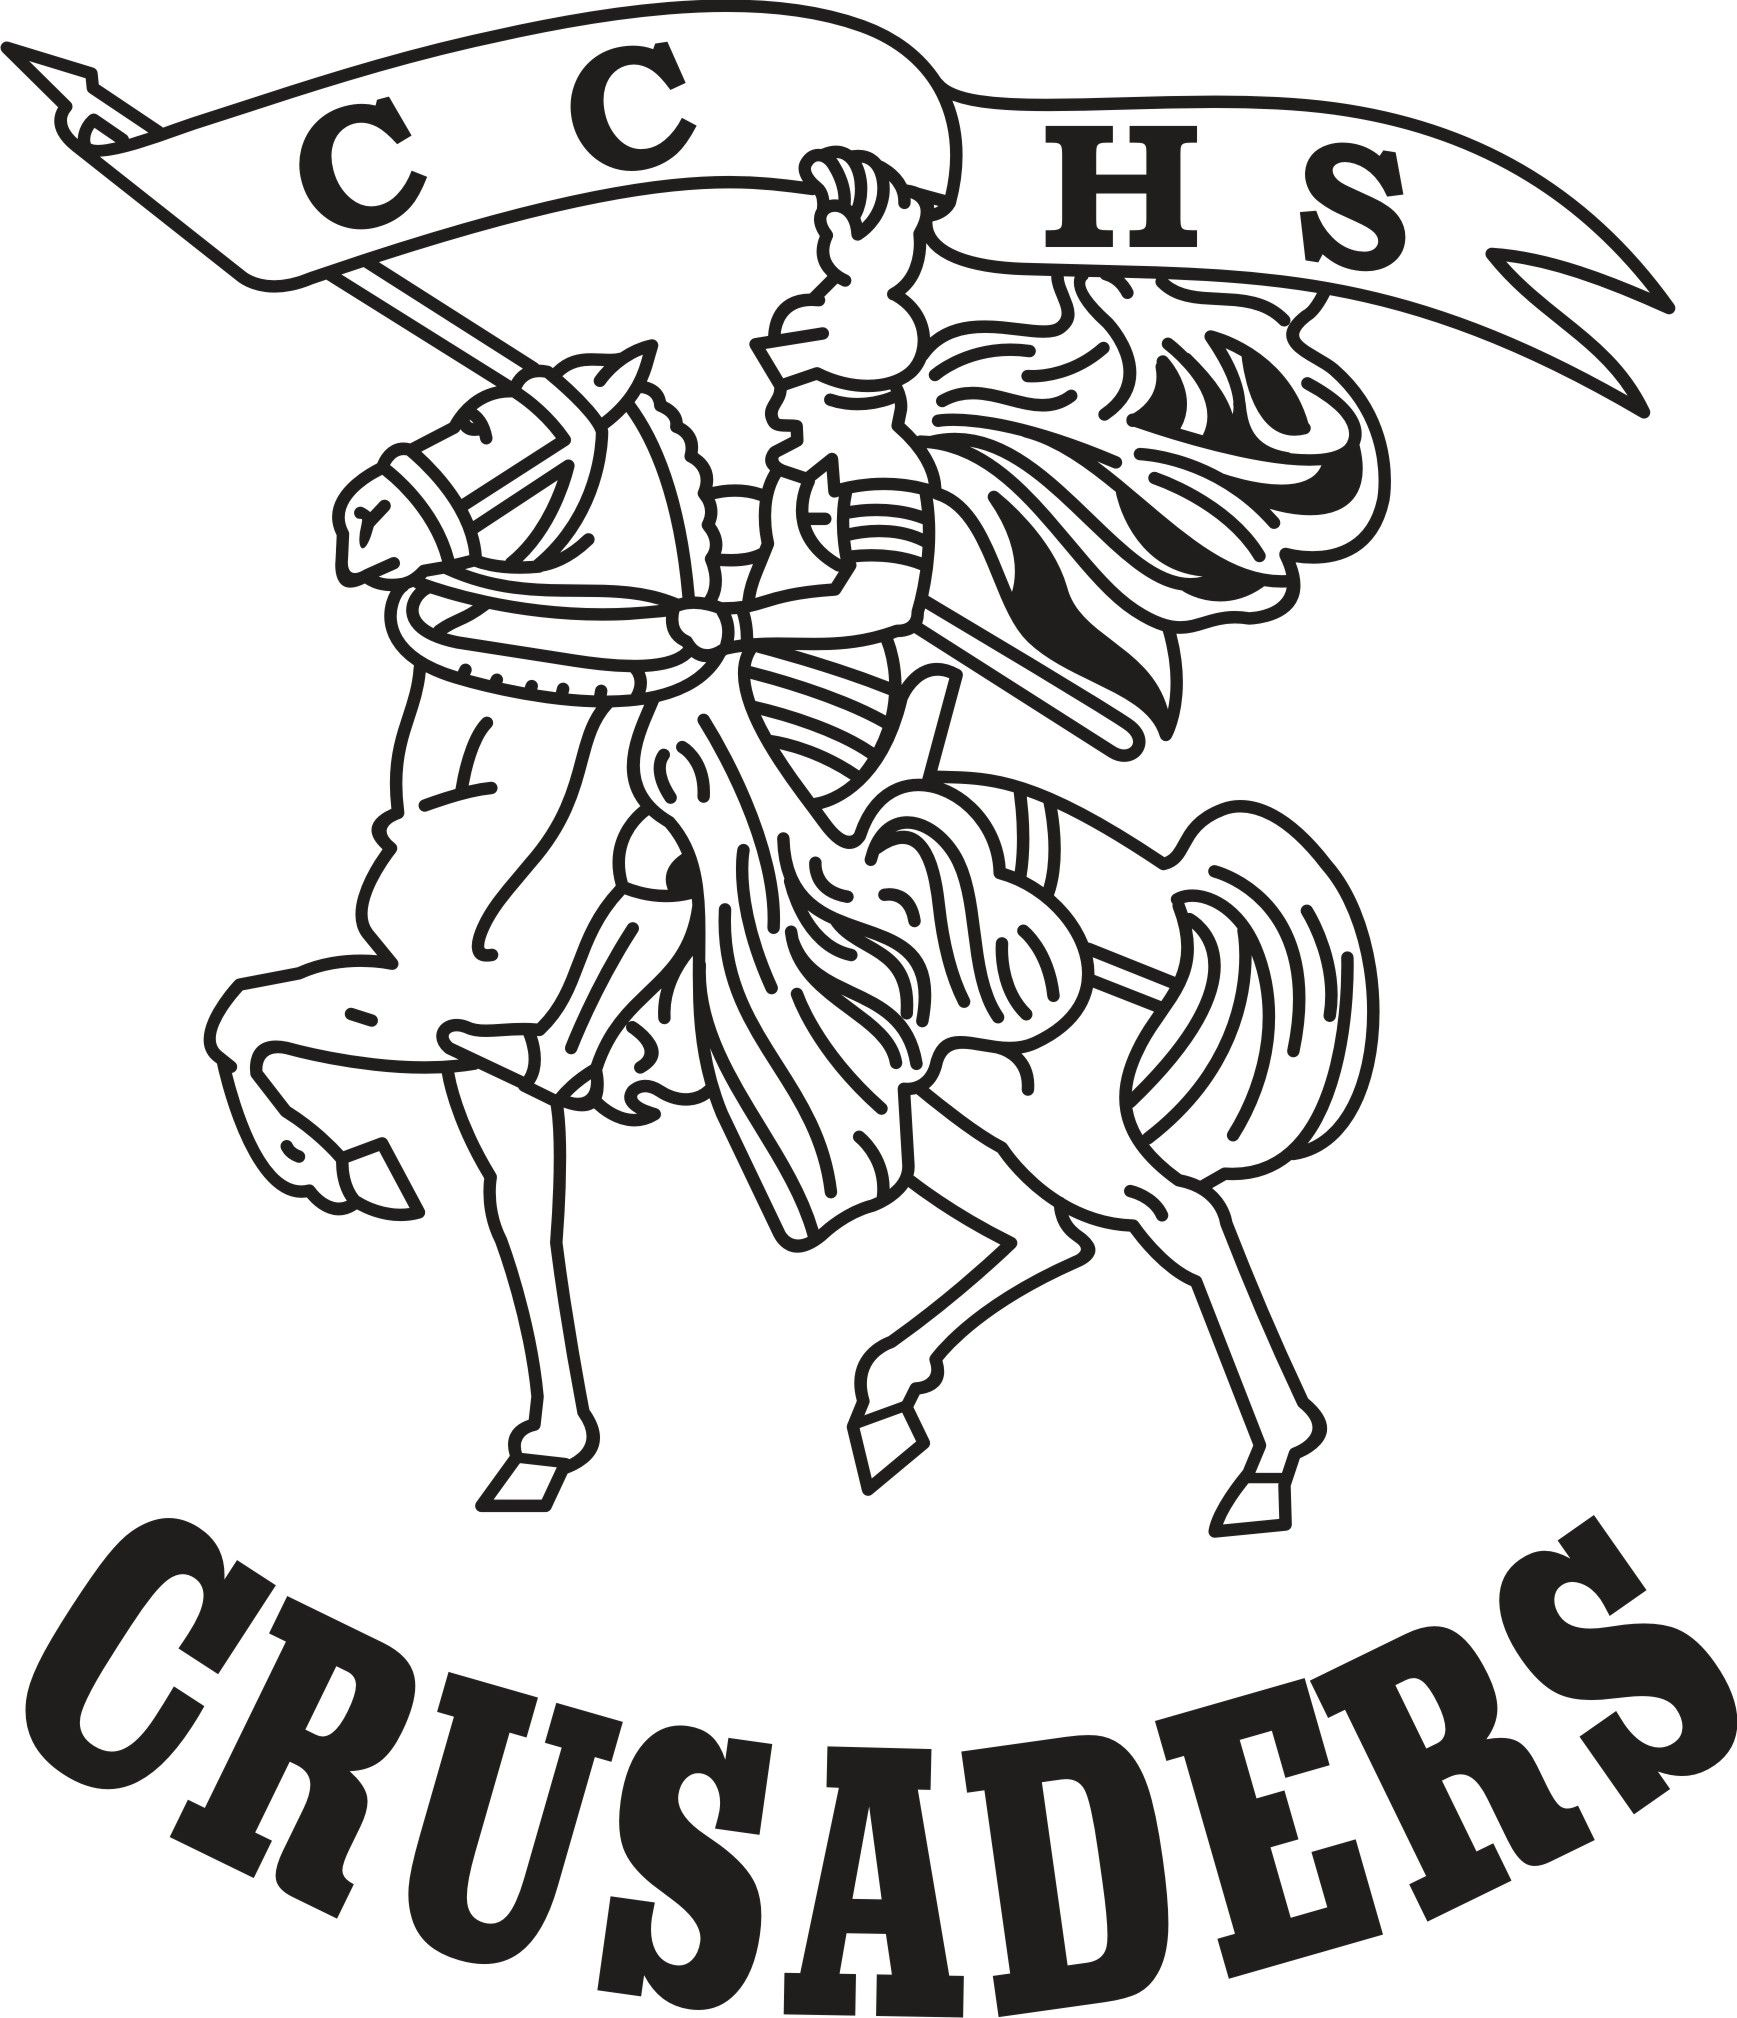 Seton Catholic Central Logo : The Crusaders 1963-1976